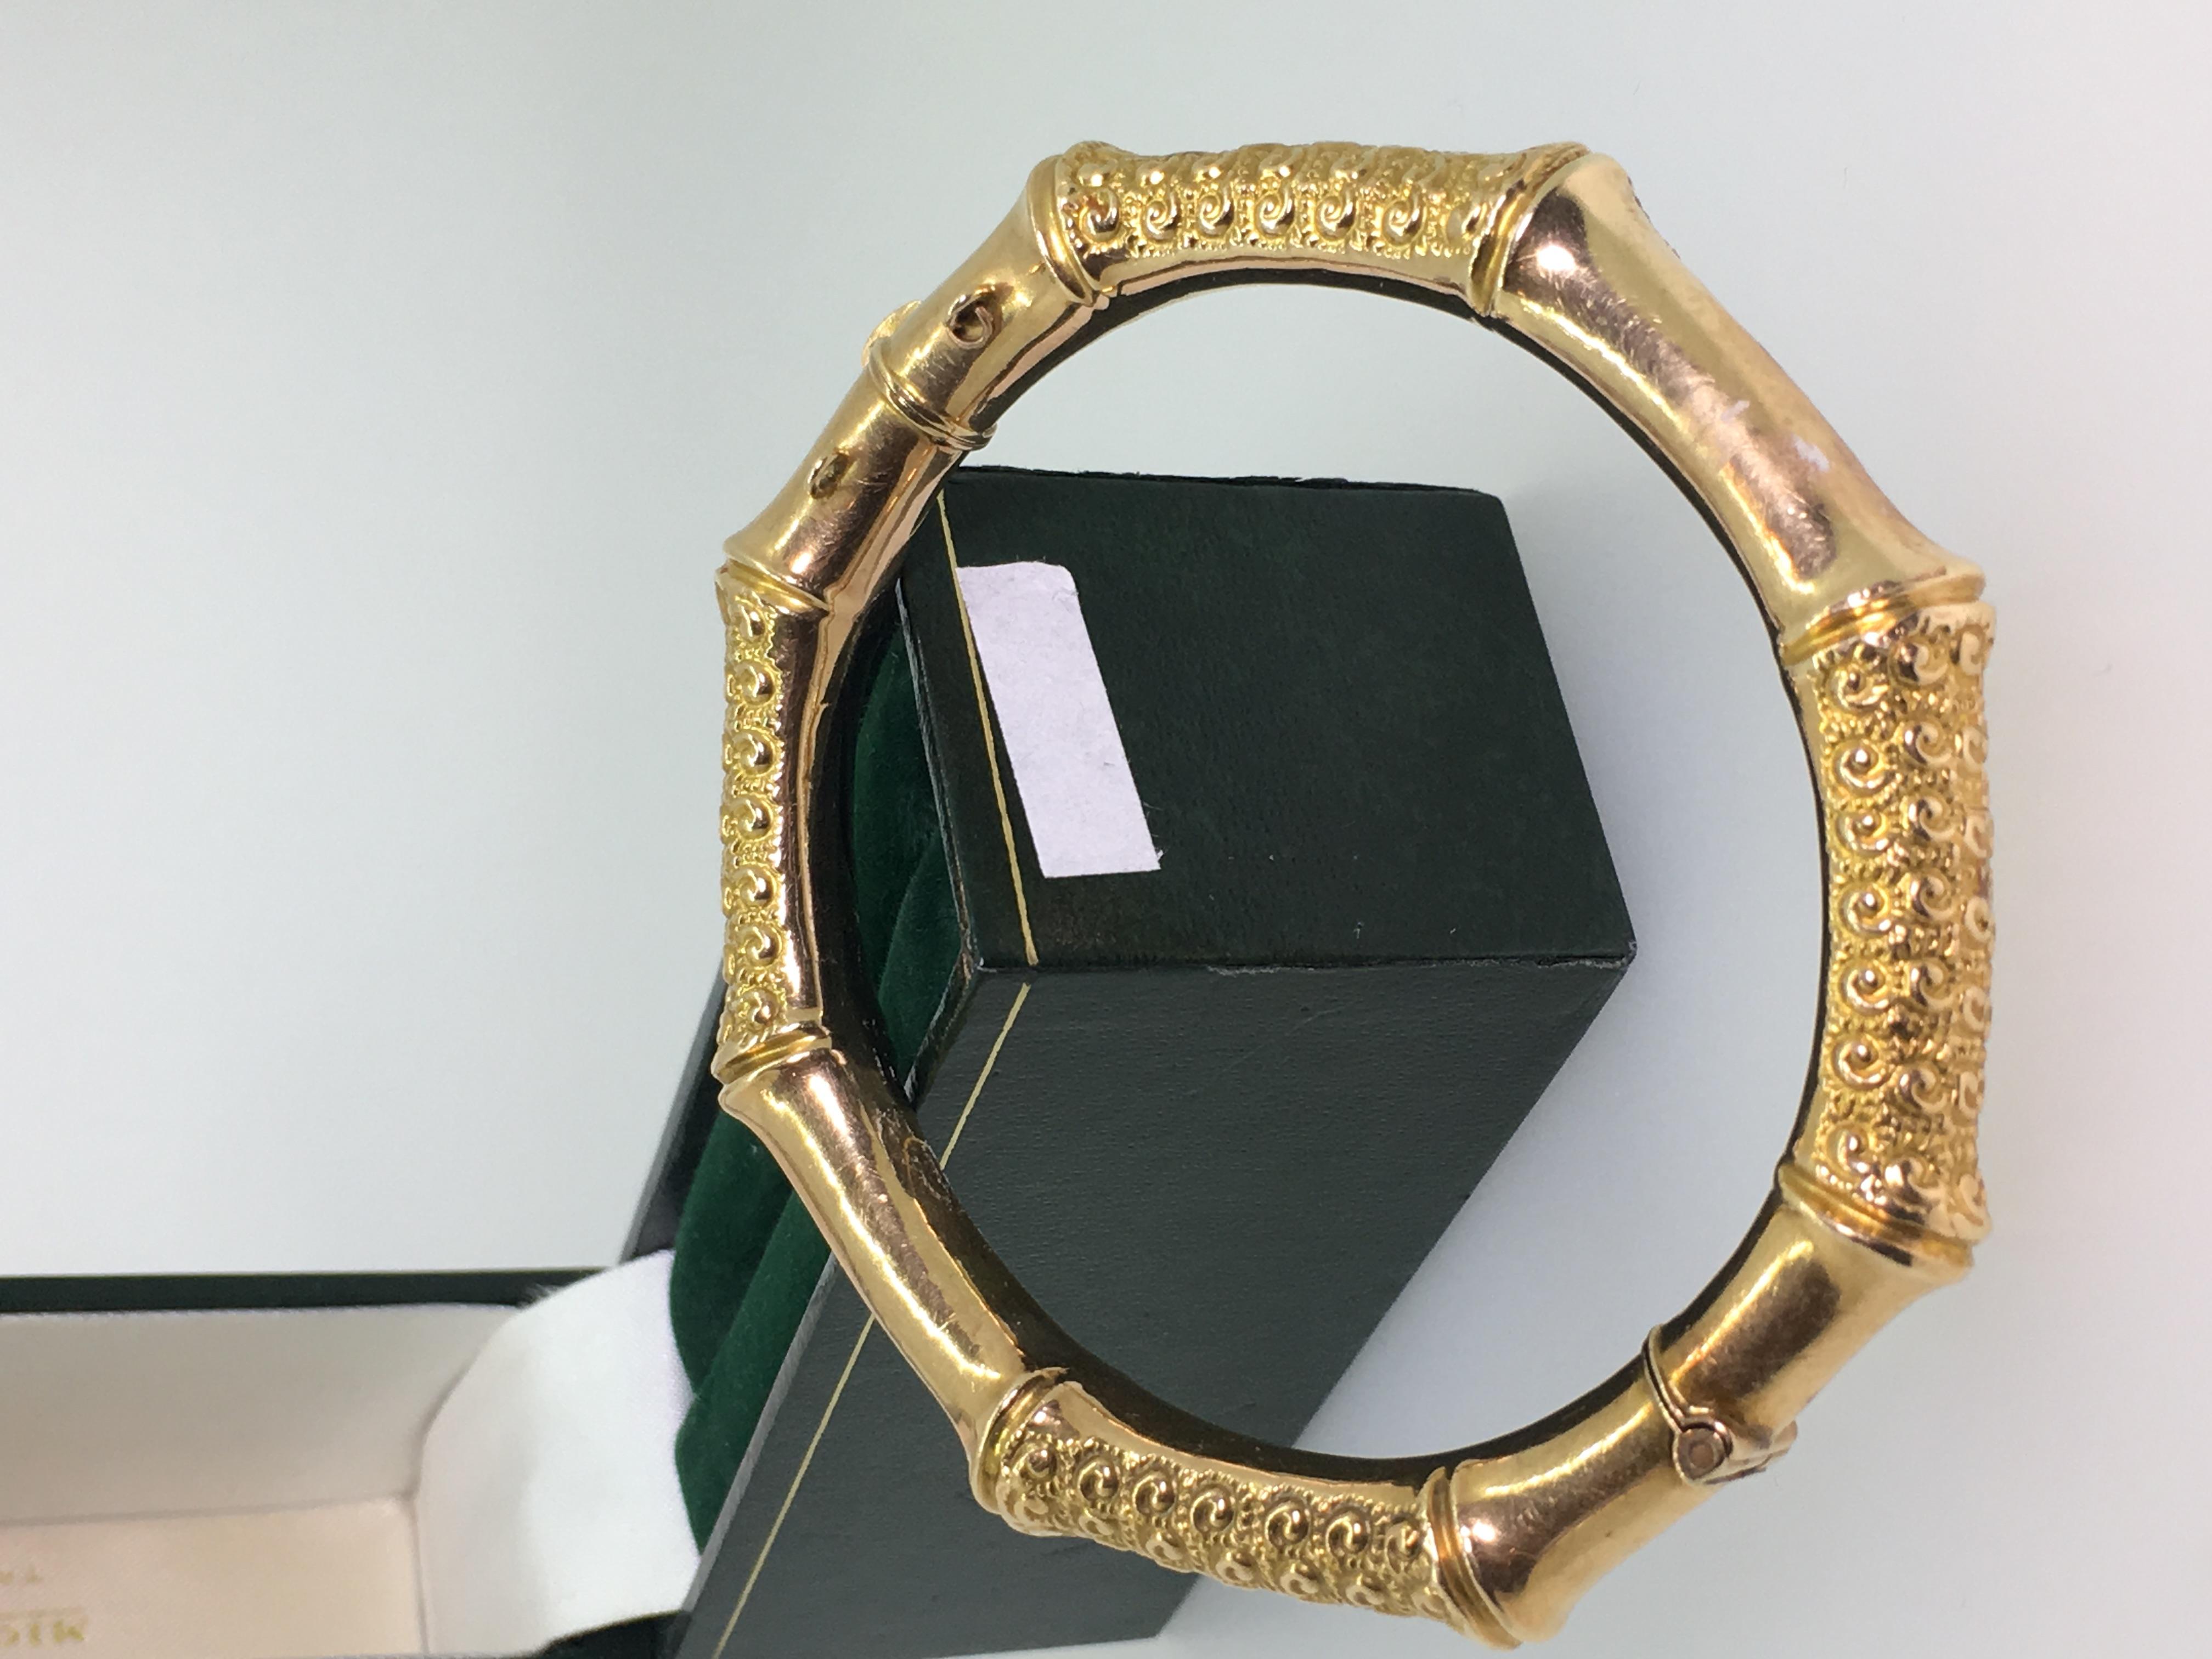 ANTIQUE 15K GOLD BAMBOO BANGLE